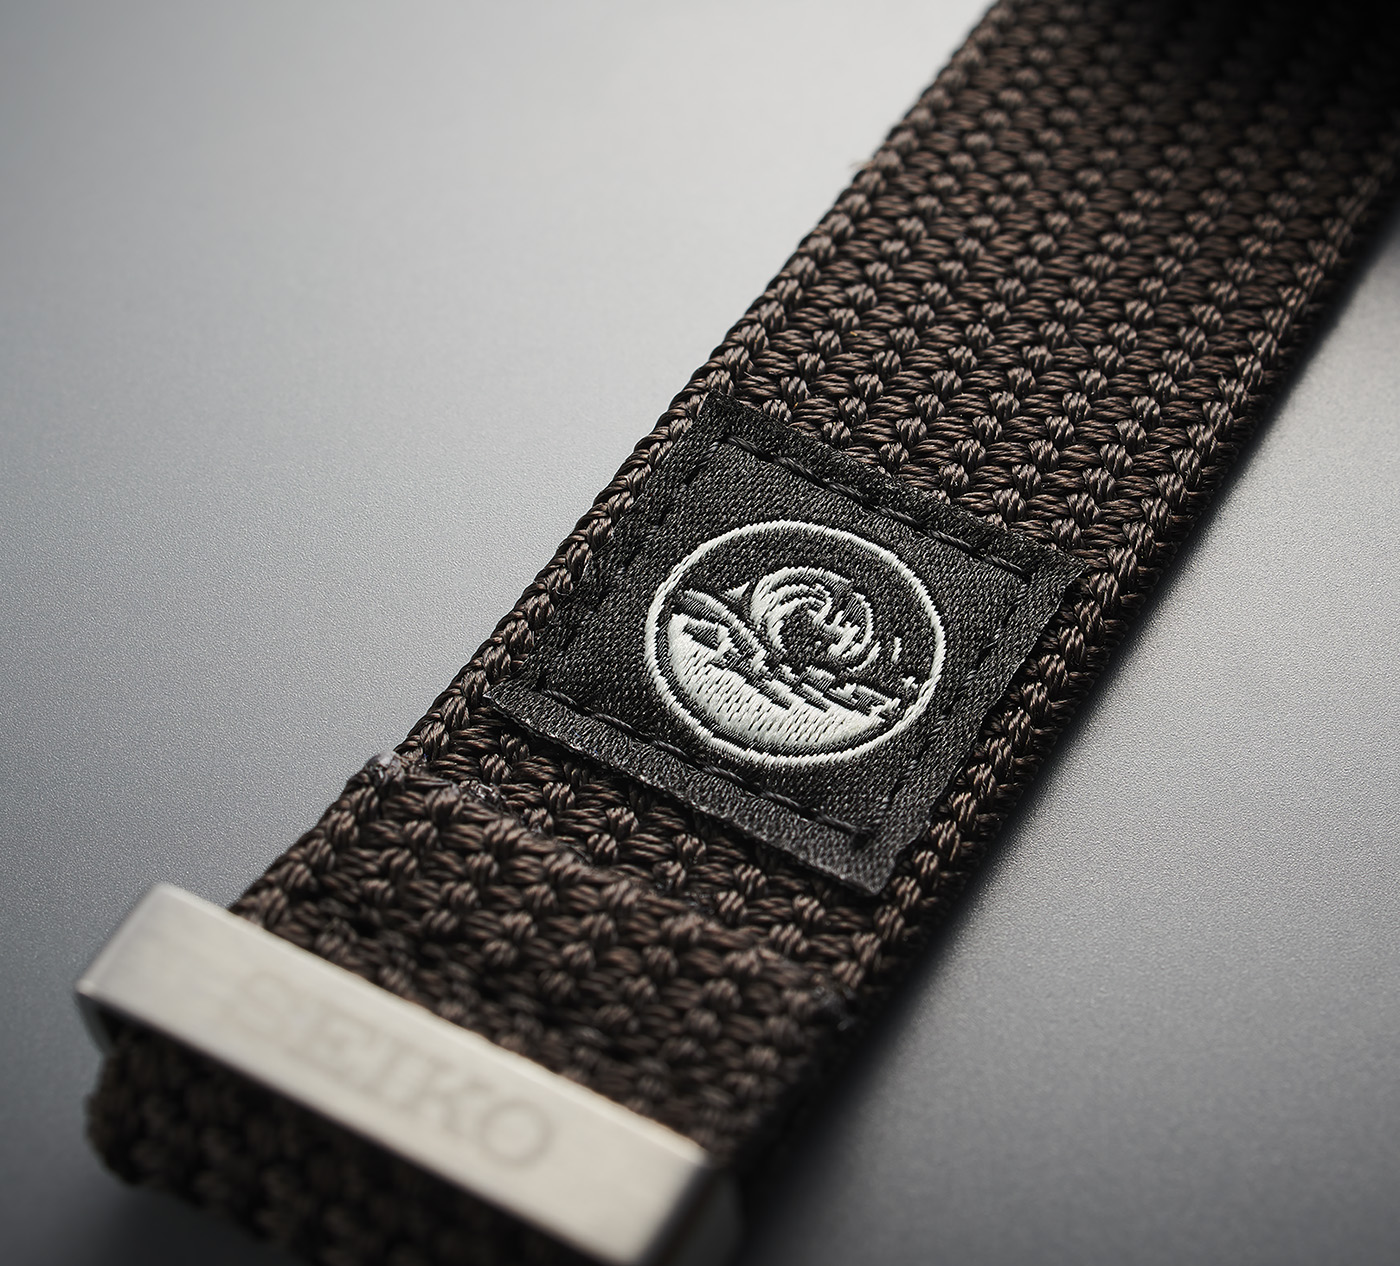 Seiko представляет часы для дайвинга Prospex SPB237 и Prospex SPB239 с тканевыми ремнями в винтажном стиле